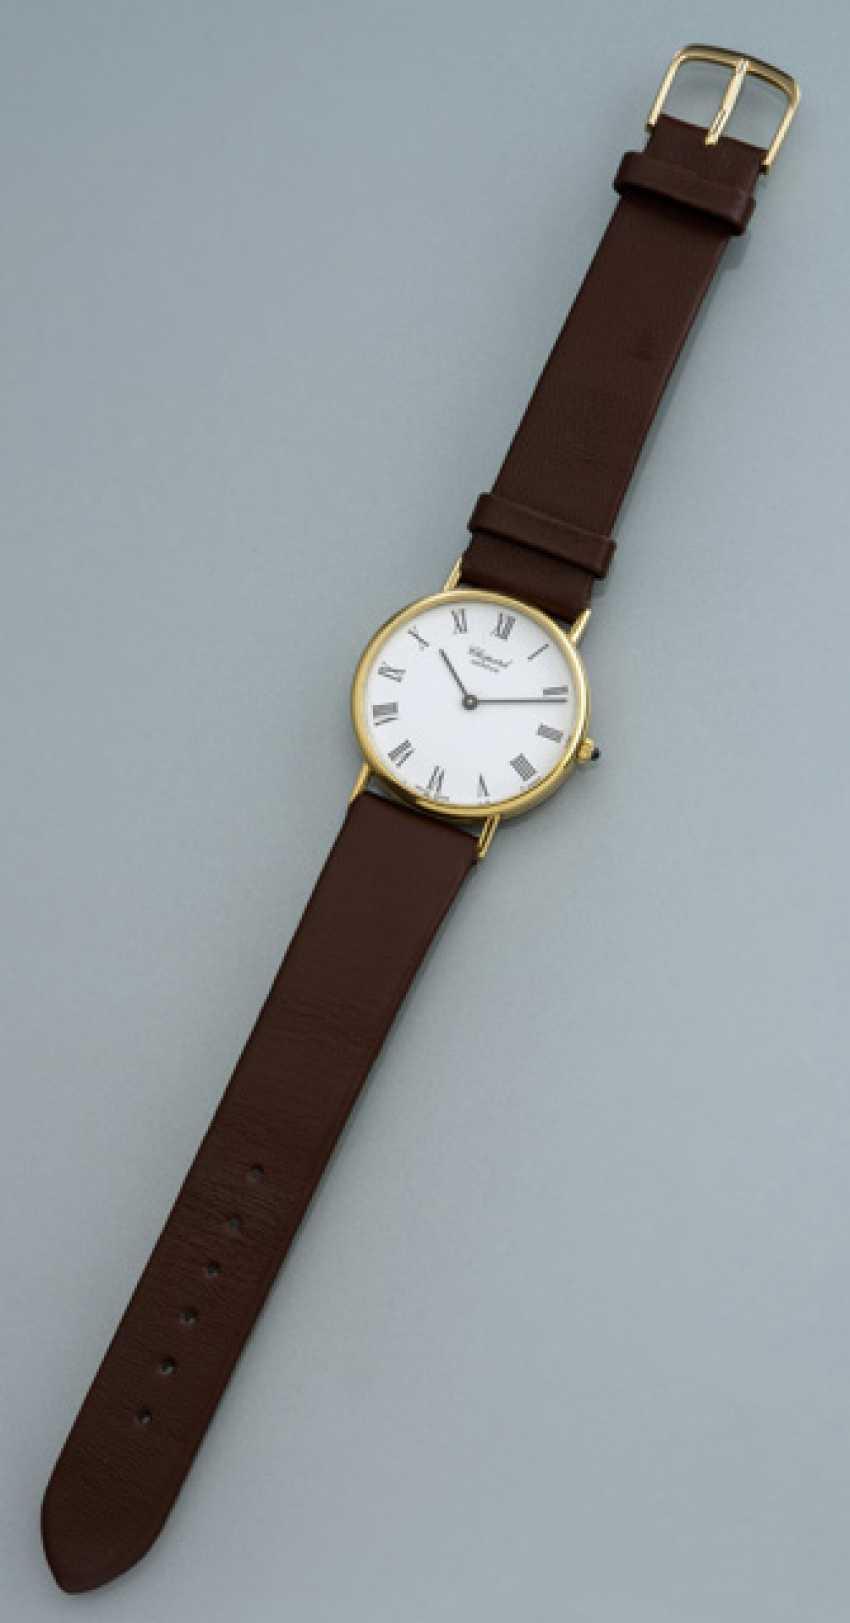 Chopard Gent's wristwatch in 18K yellow Gold, Ref. 1091 - photo 1